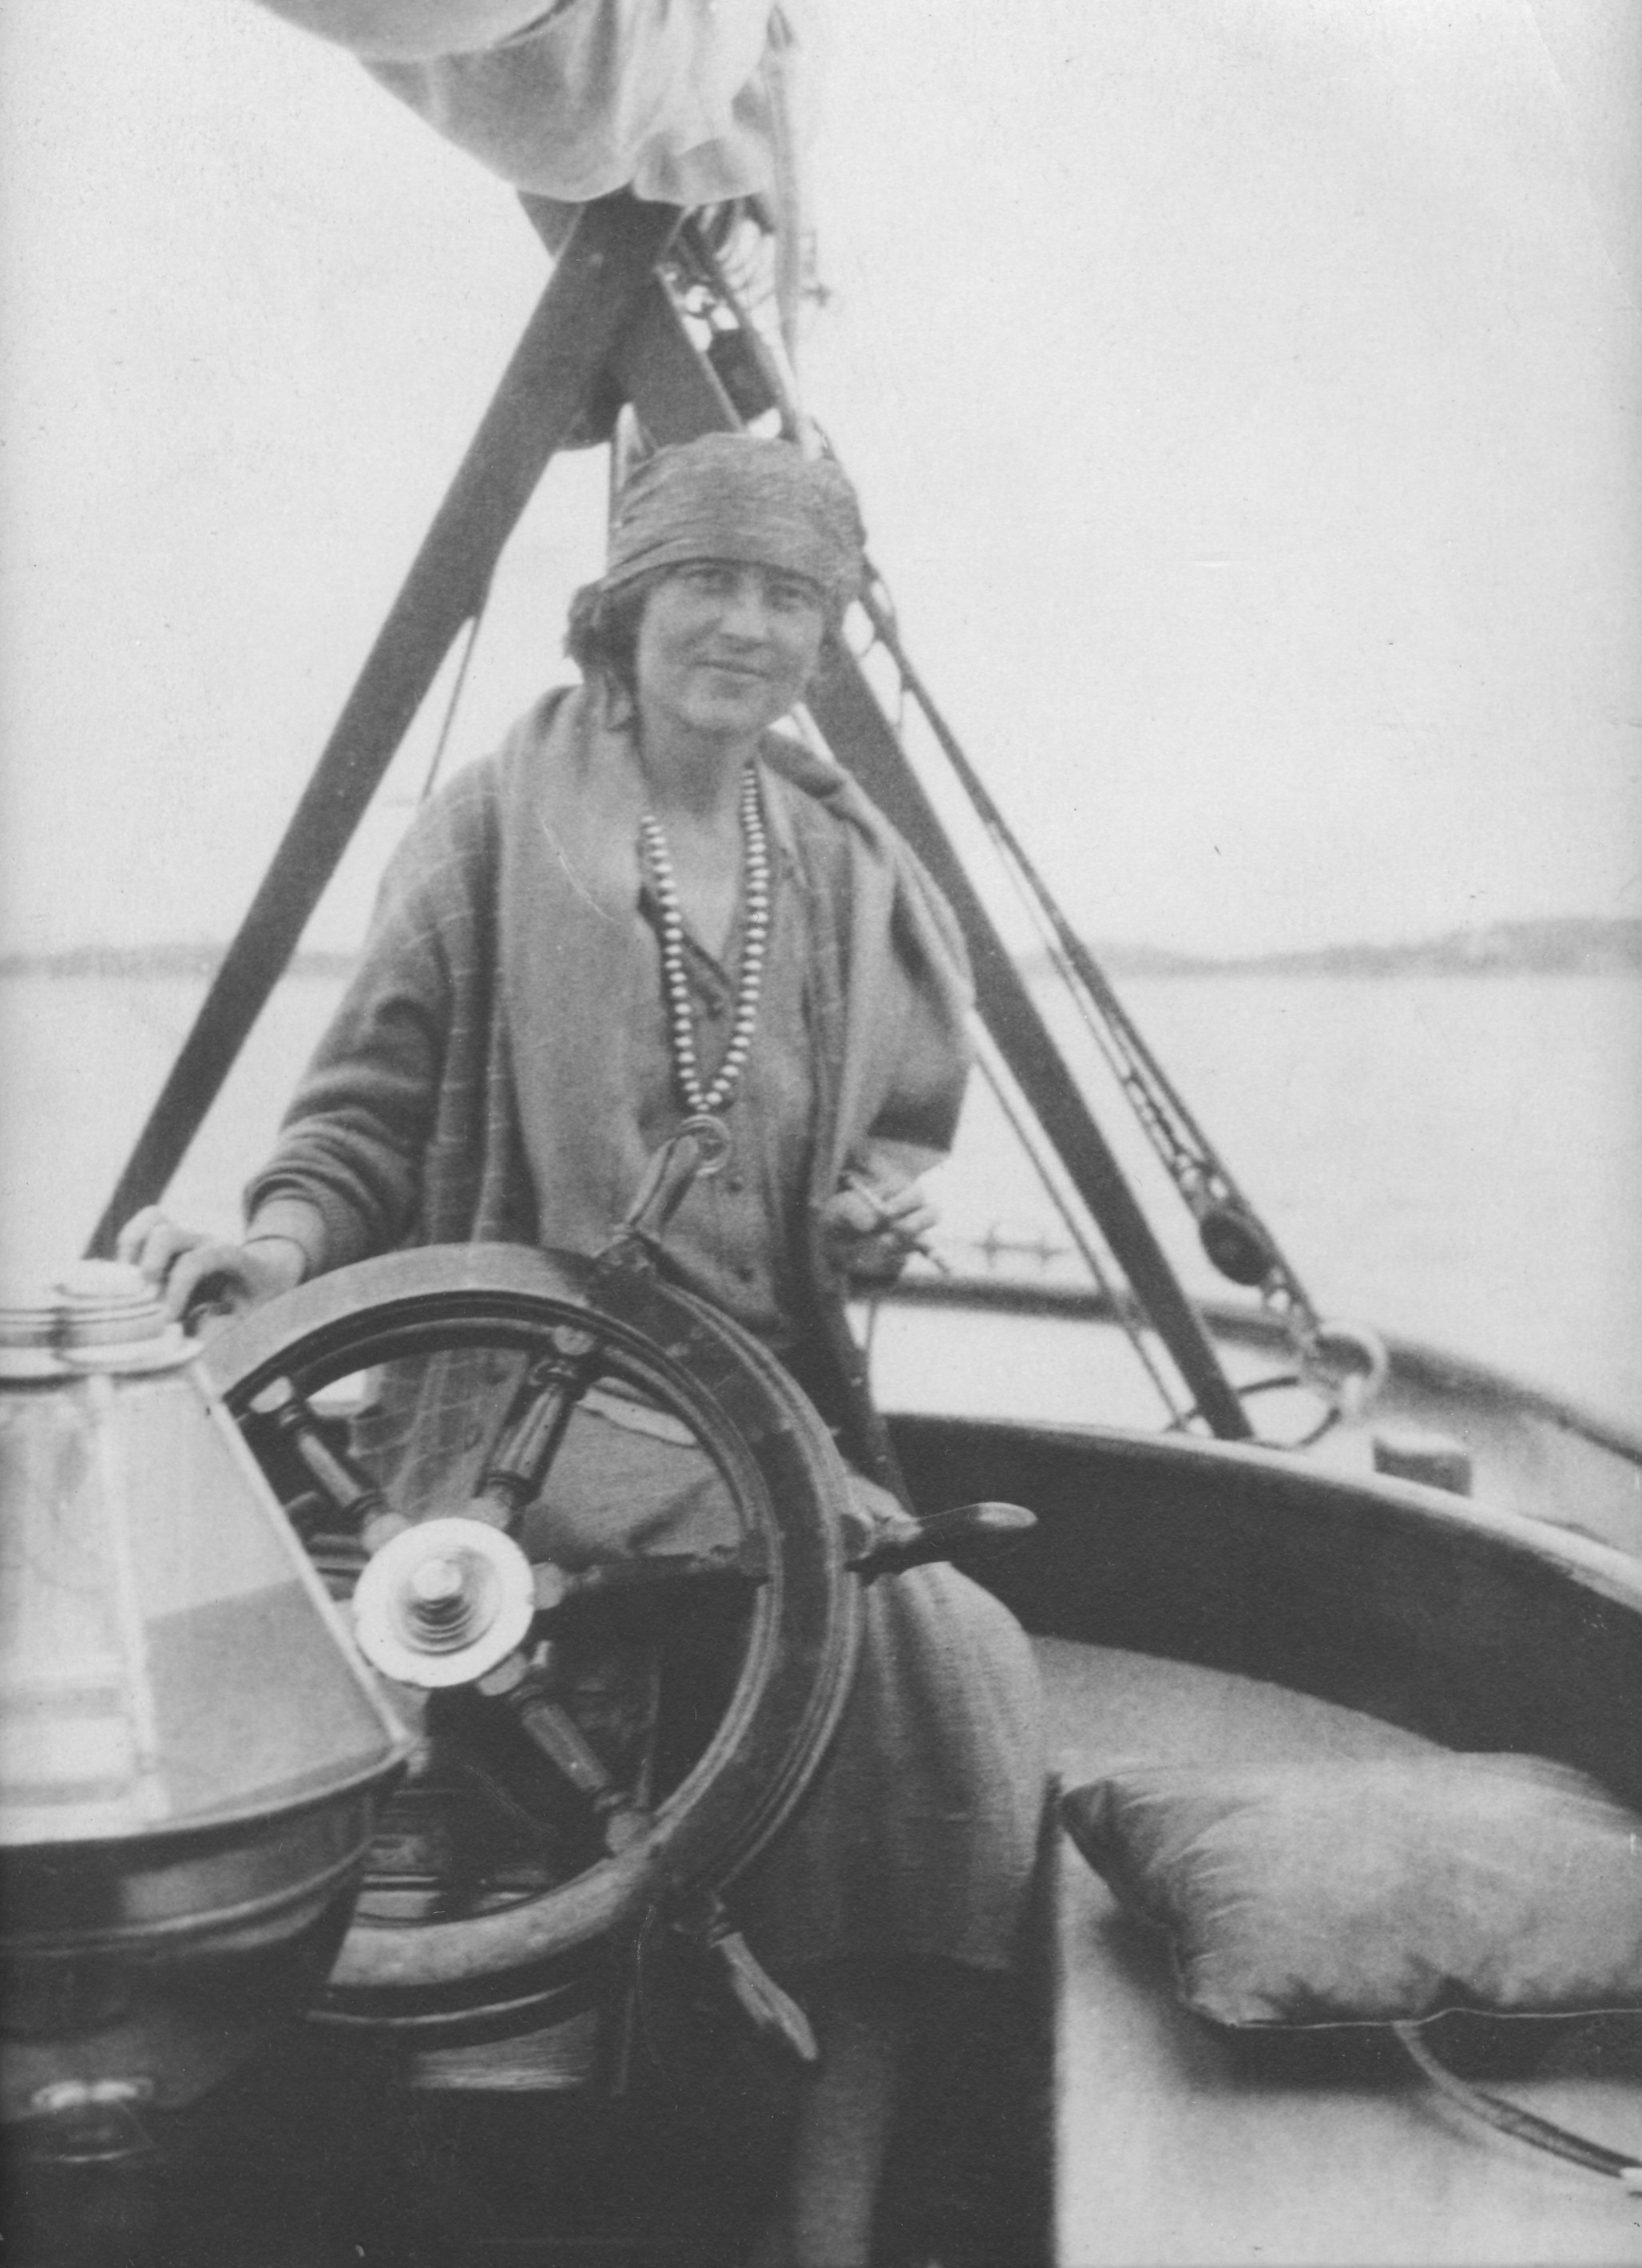 https://upload.wikimedia.org/wikipedia/commons/5/53/Elsie_Clews_Parsons_aboard_Malabar_V.jpg